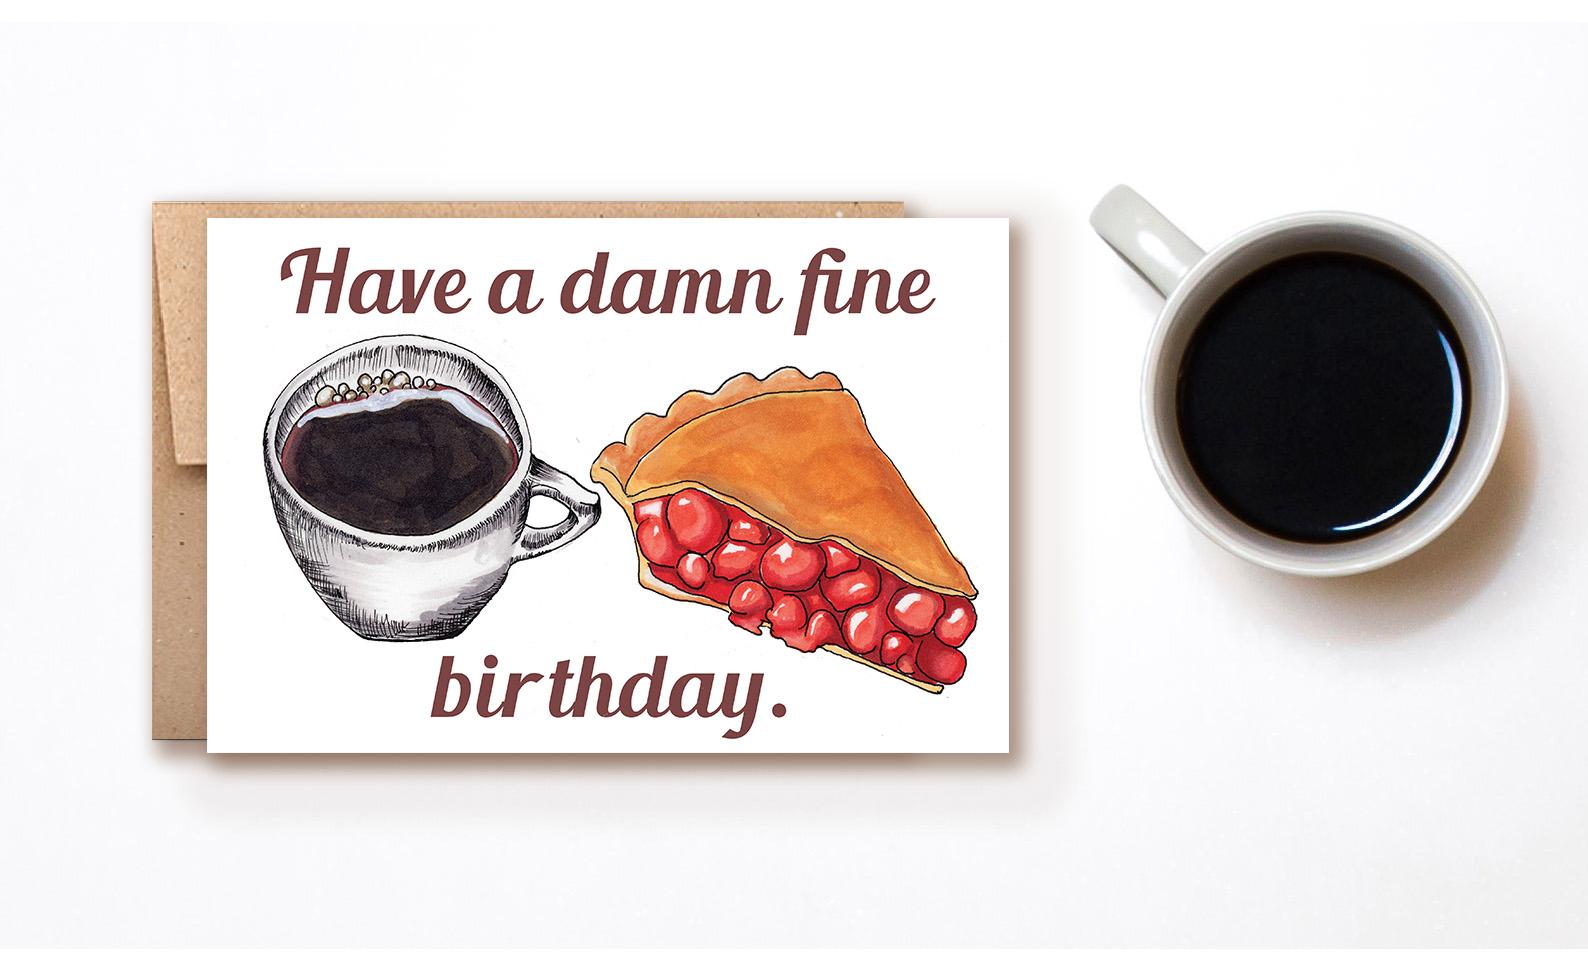 Shop my handmade merch on Etsy. - Greeting cards, custom art, gift wrap, oh my!